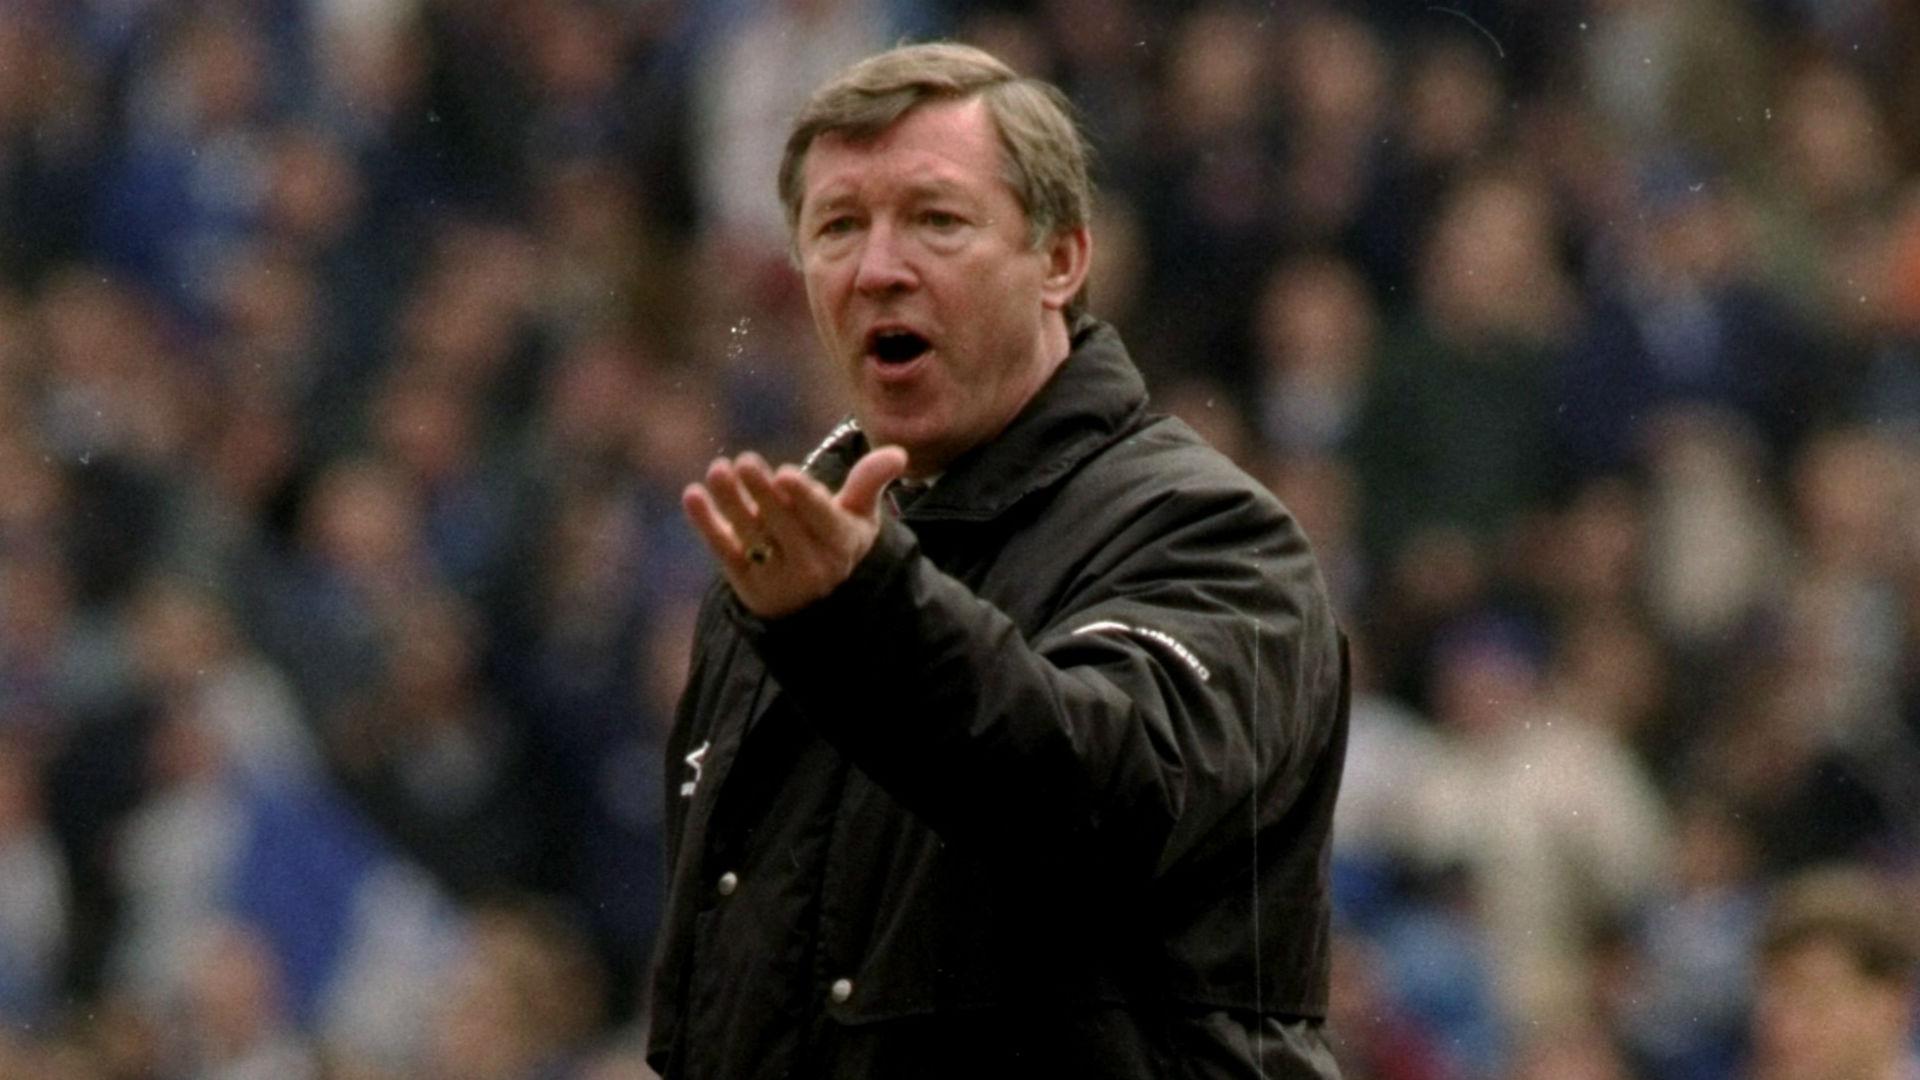 'I called Sir Alex Ferguson a Scottish b*****d!' – former Manchester United ace Kanchelskis